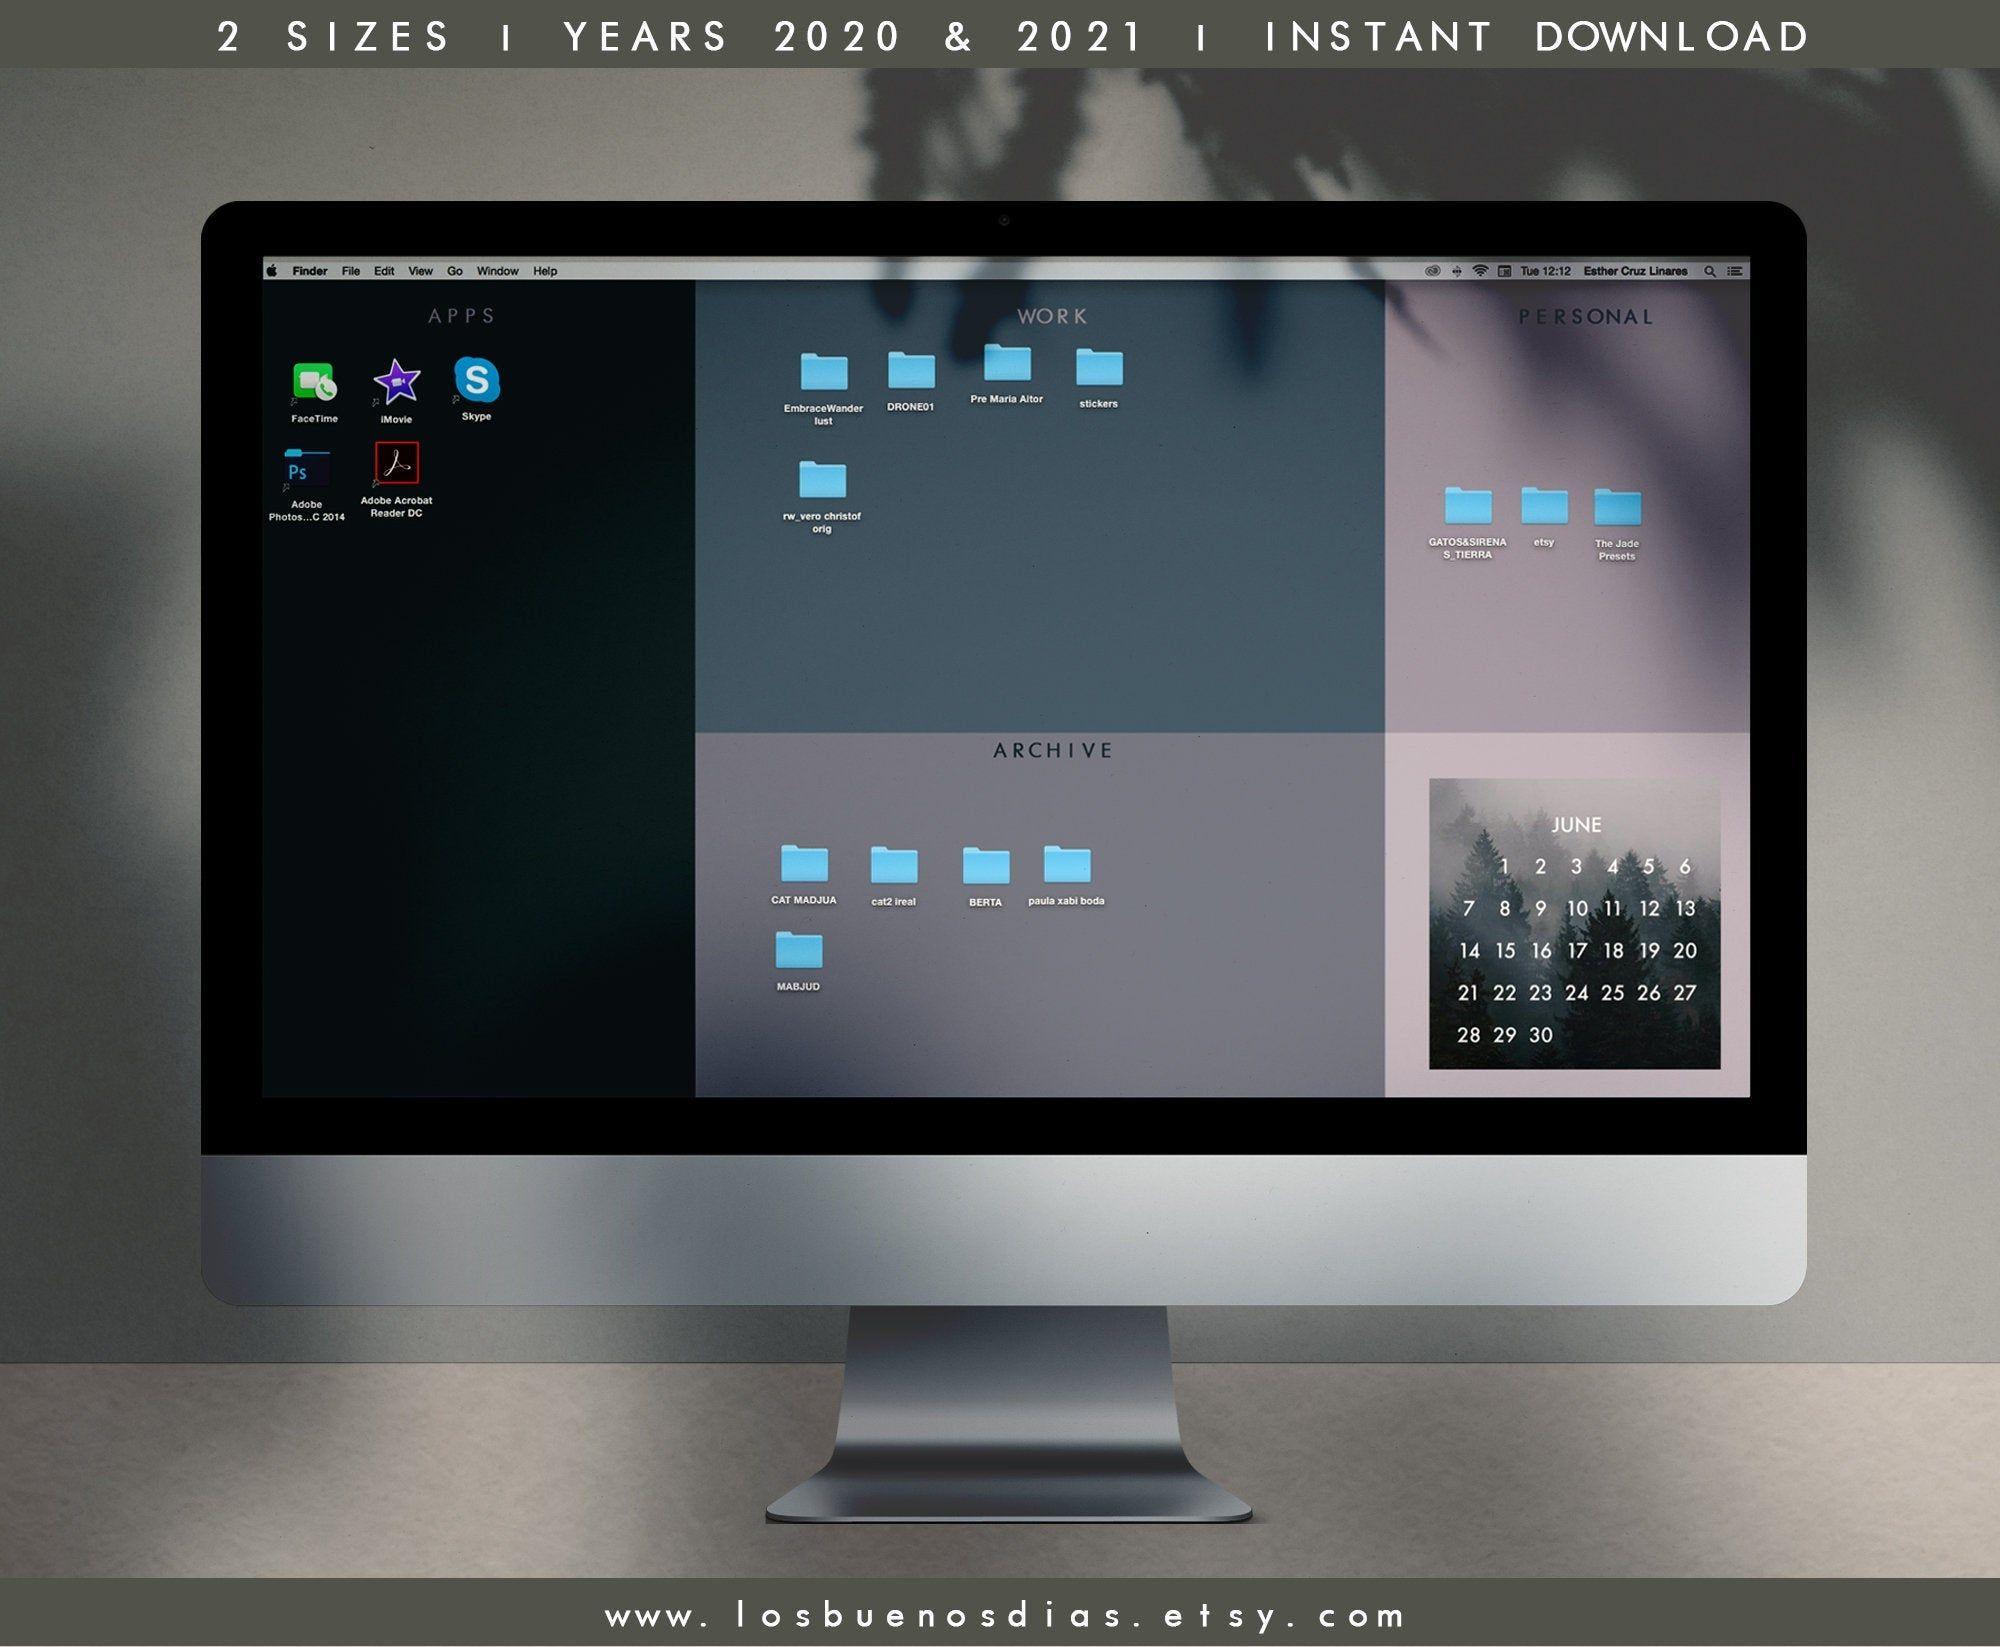 Best Way To Organize Digital Photos 2021 Desktop wallpaper organizer with 2020 2021 calendar, dark desktop